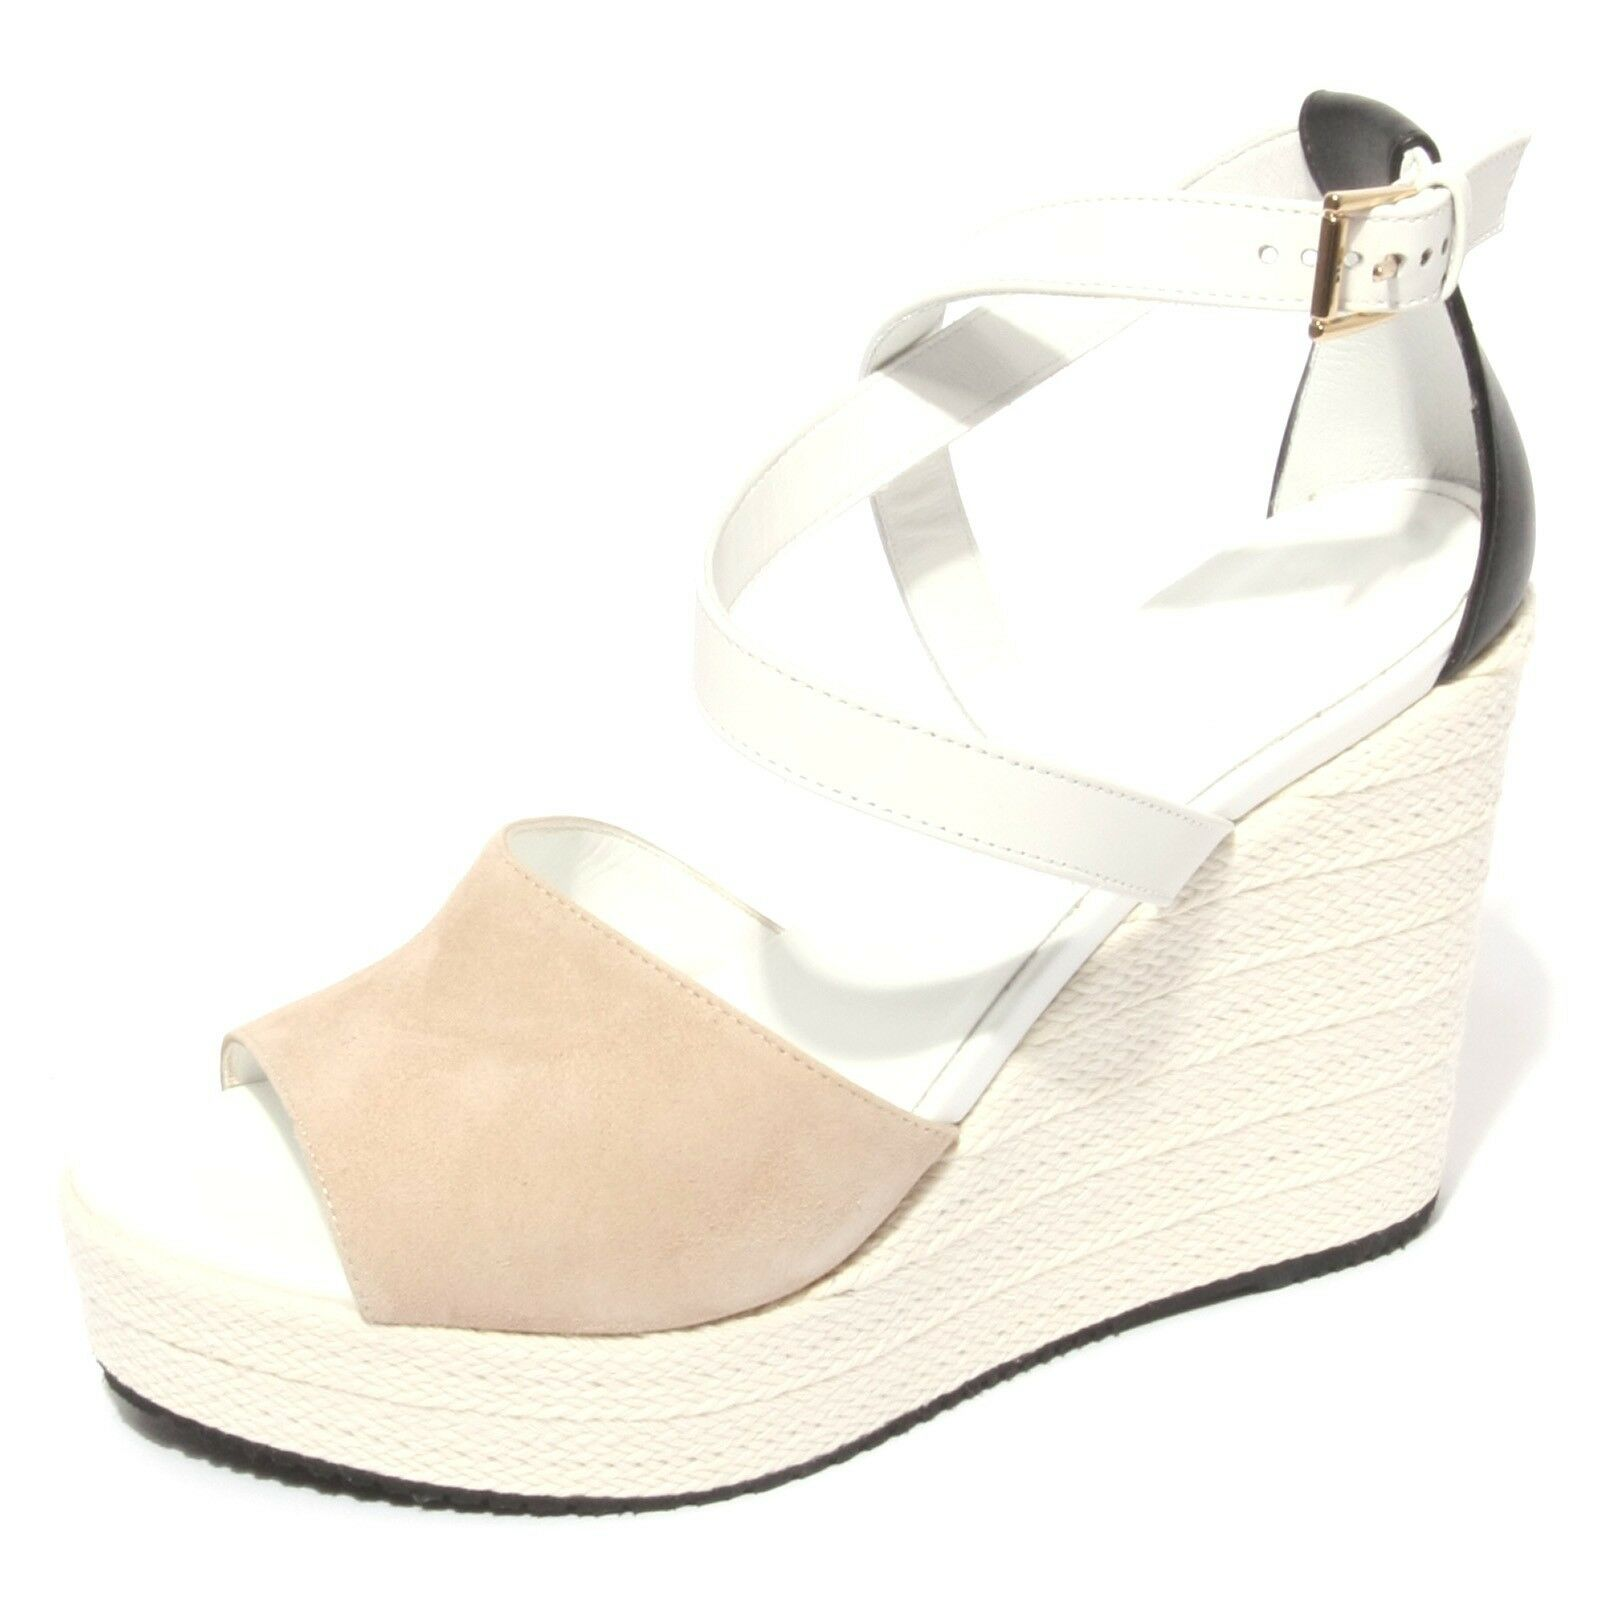 B0604 B0604 B0604 sandalo mujer Hogan Scarpa Zeppa Corda zapatos mujer  estar en gran demanda